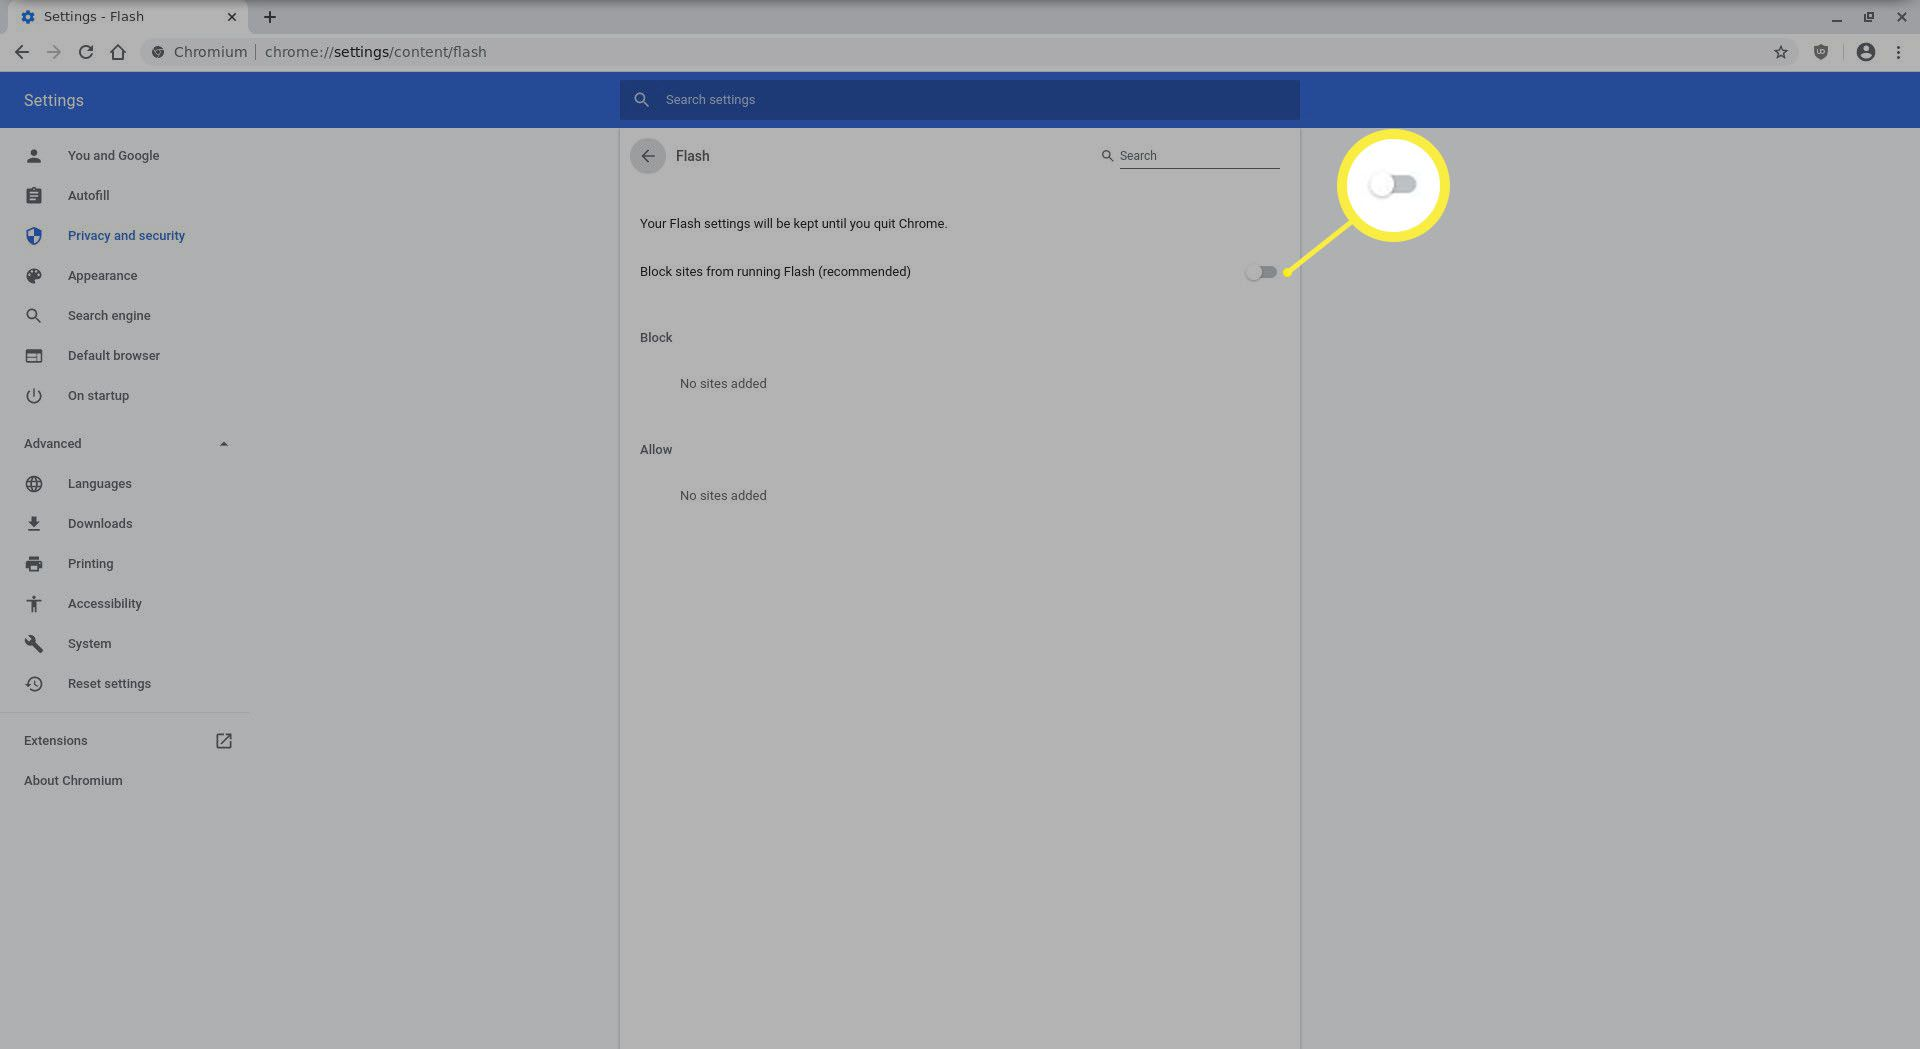 The Chrome Flash settings preference pane.